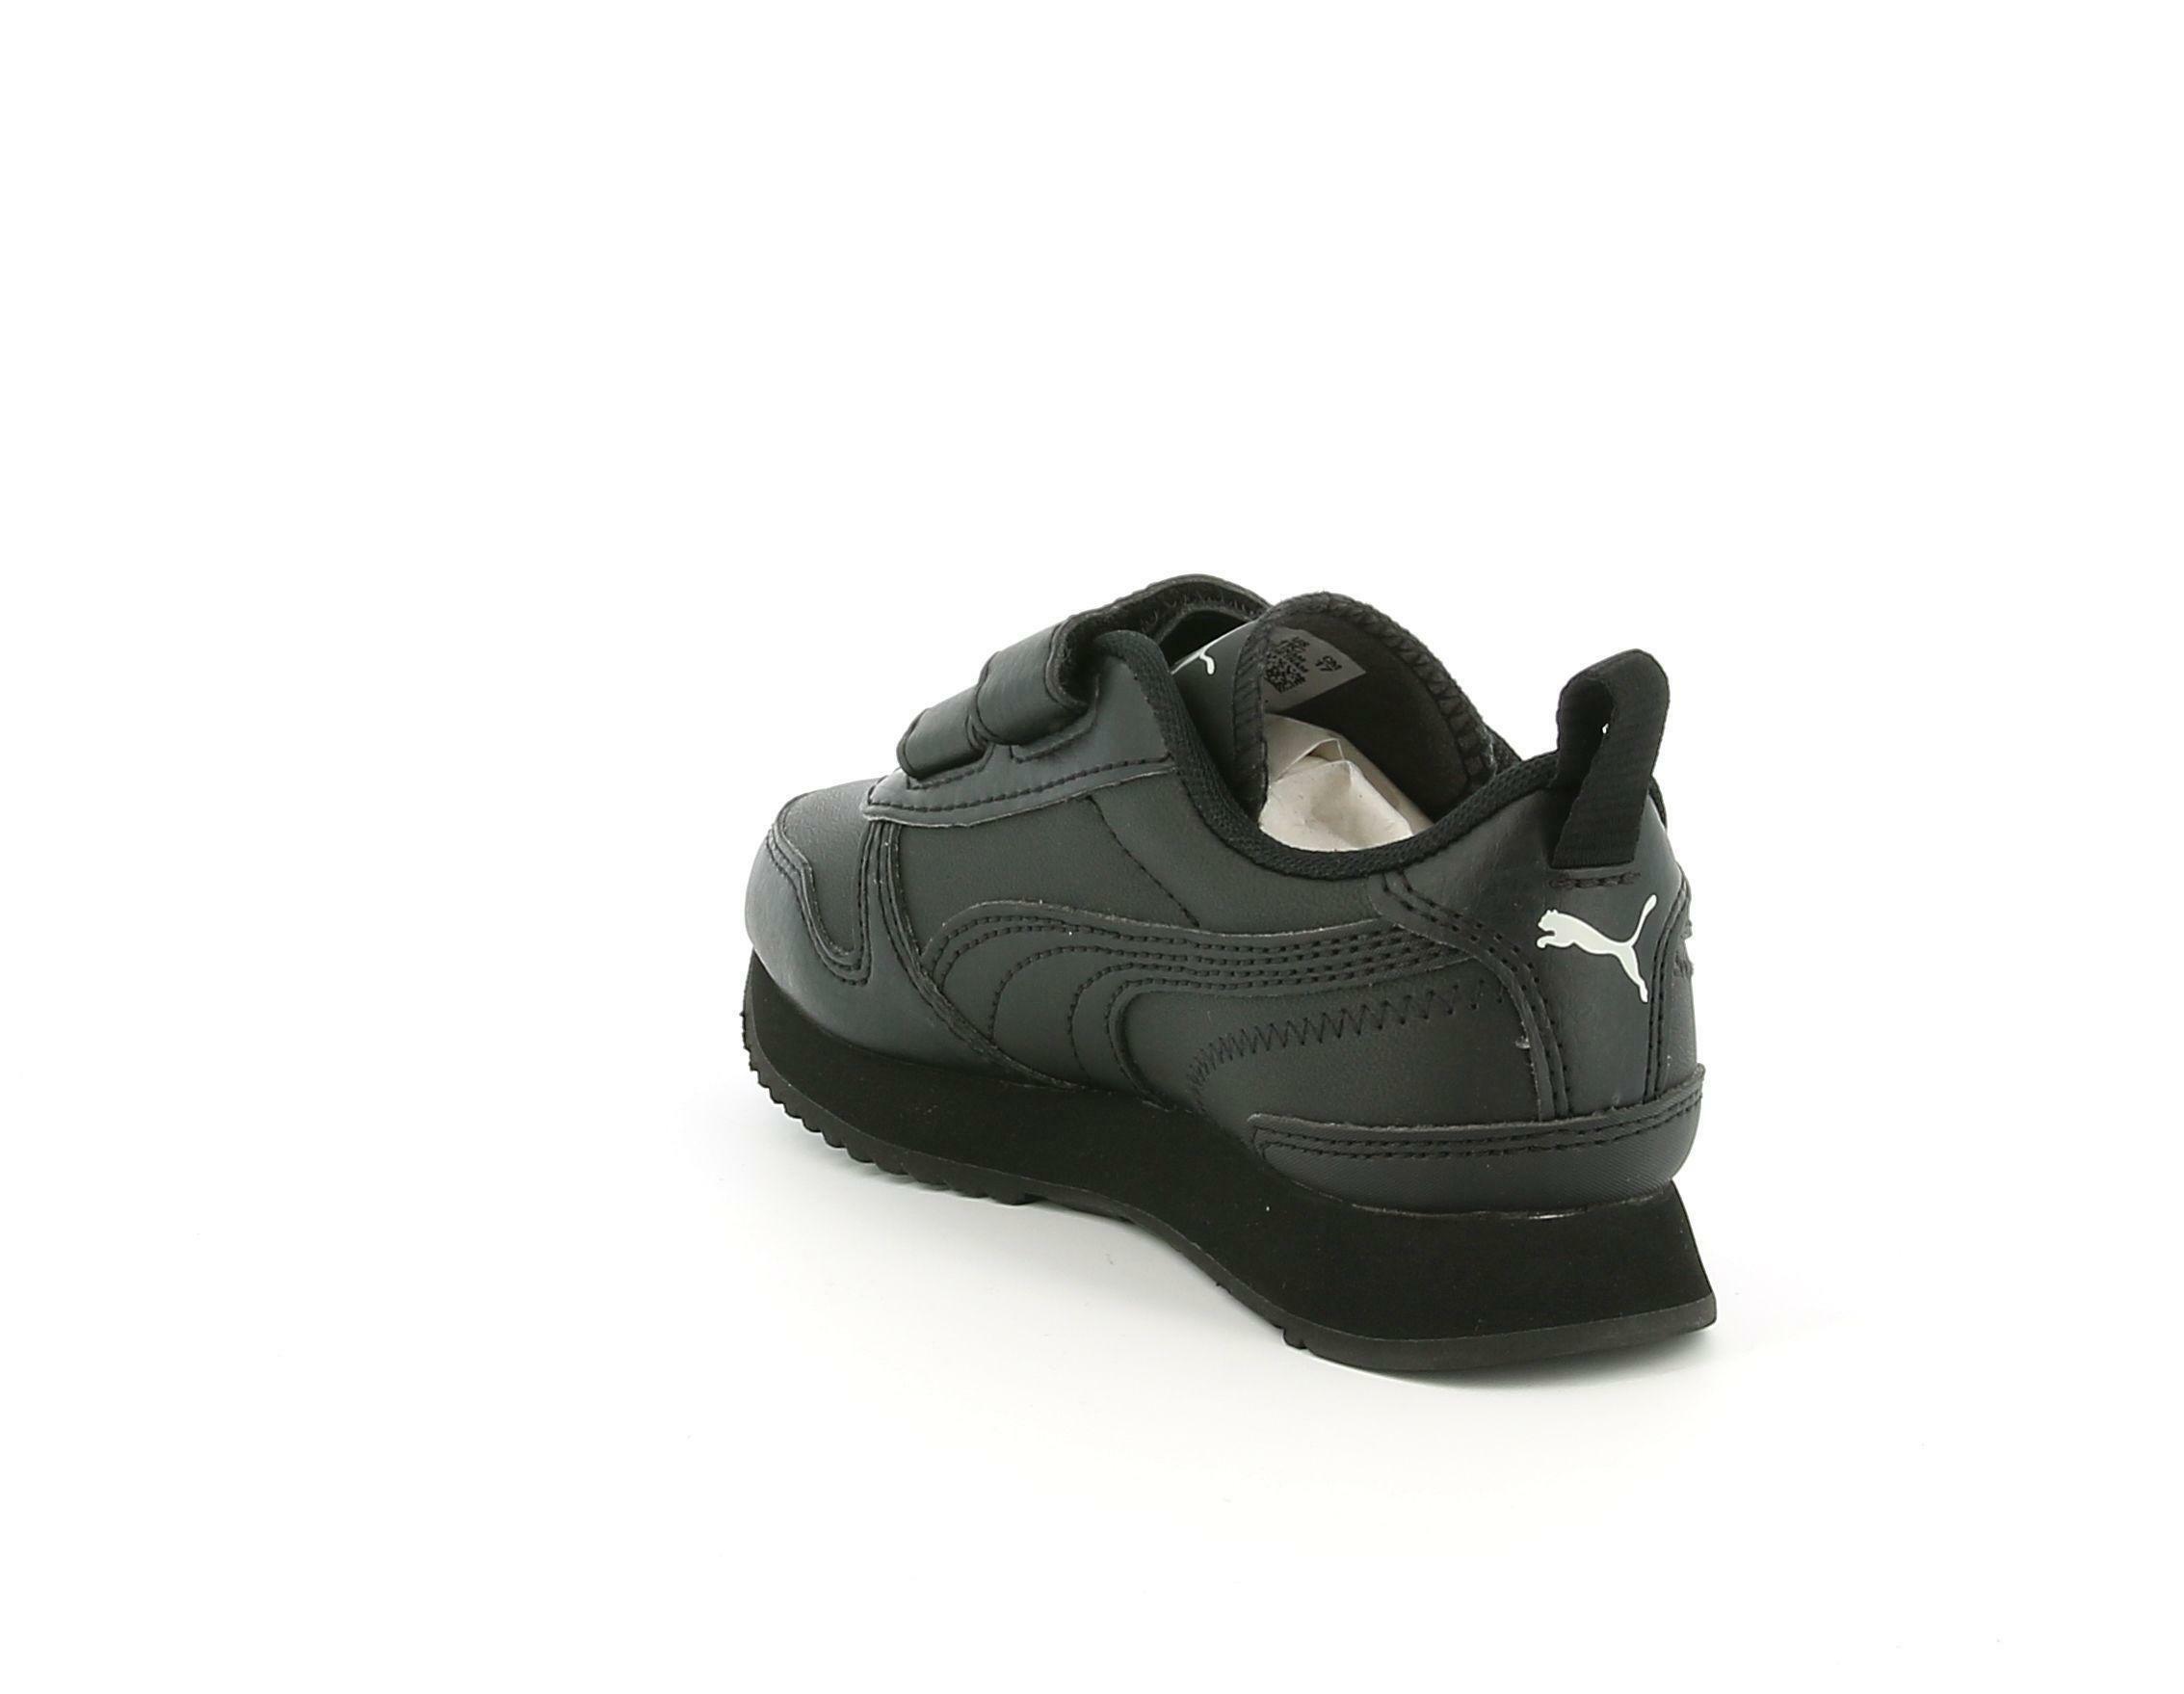 puma puma r78 sl v ps 374429 001 nero scarpe da ginnastica bambino unisex